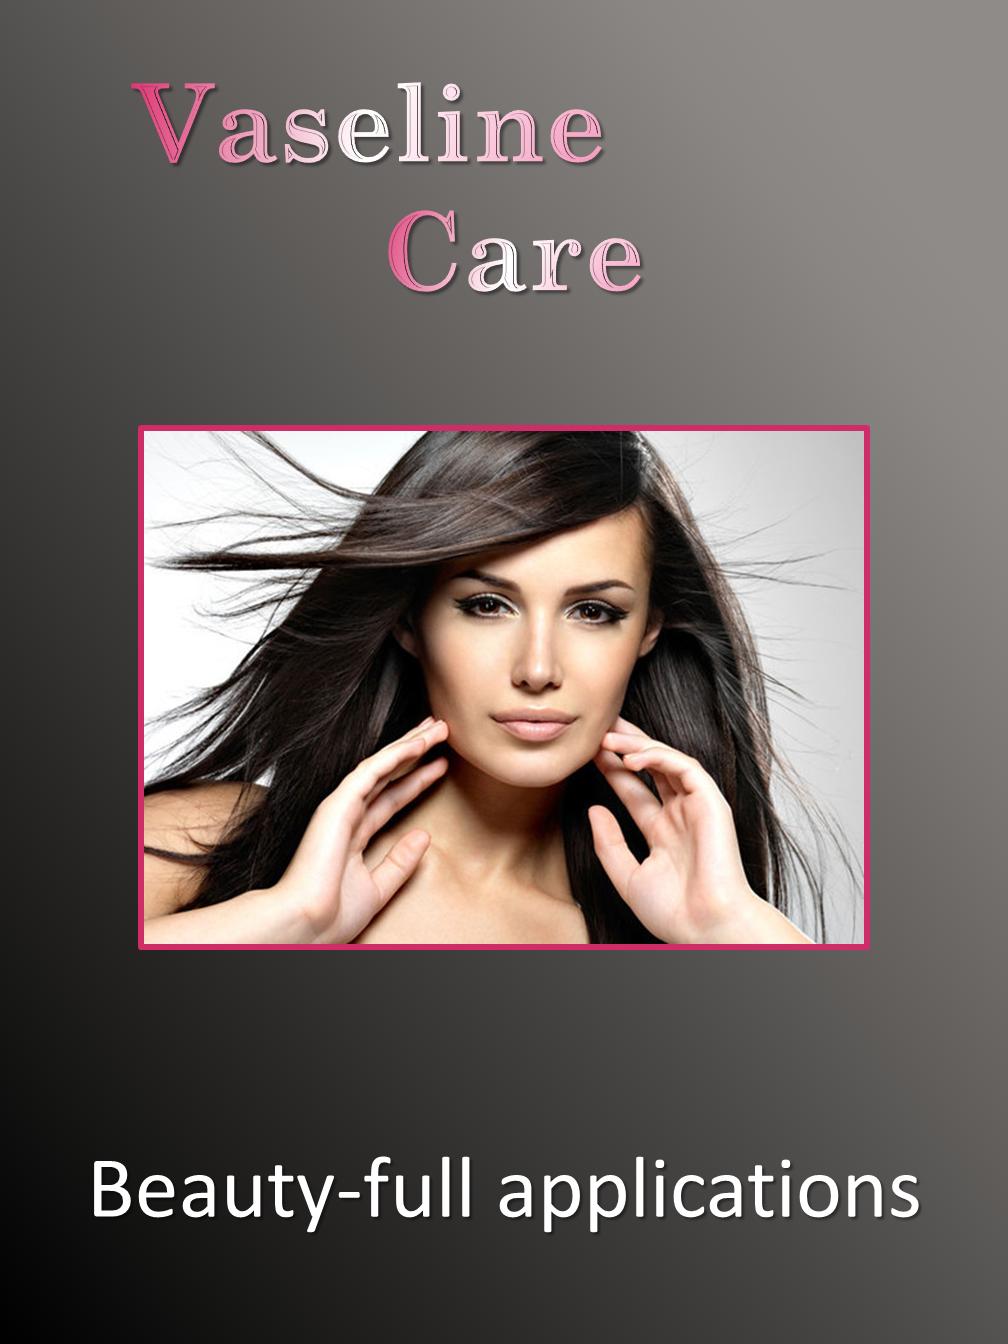 Vaseline Care